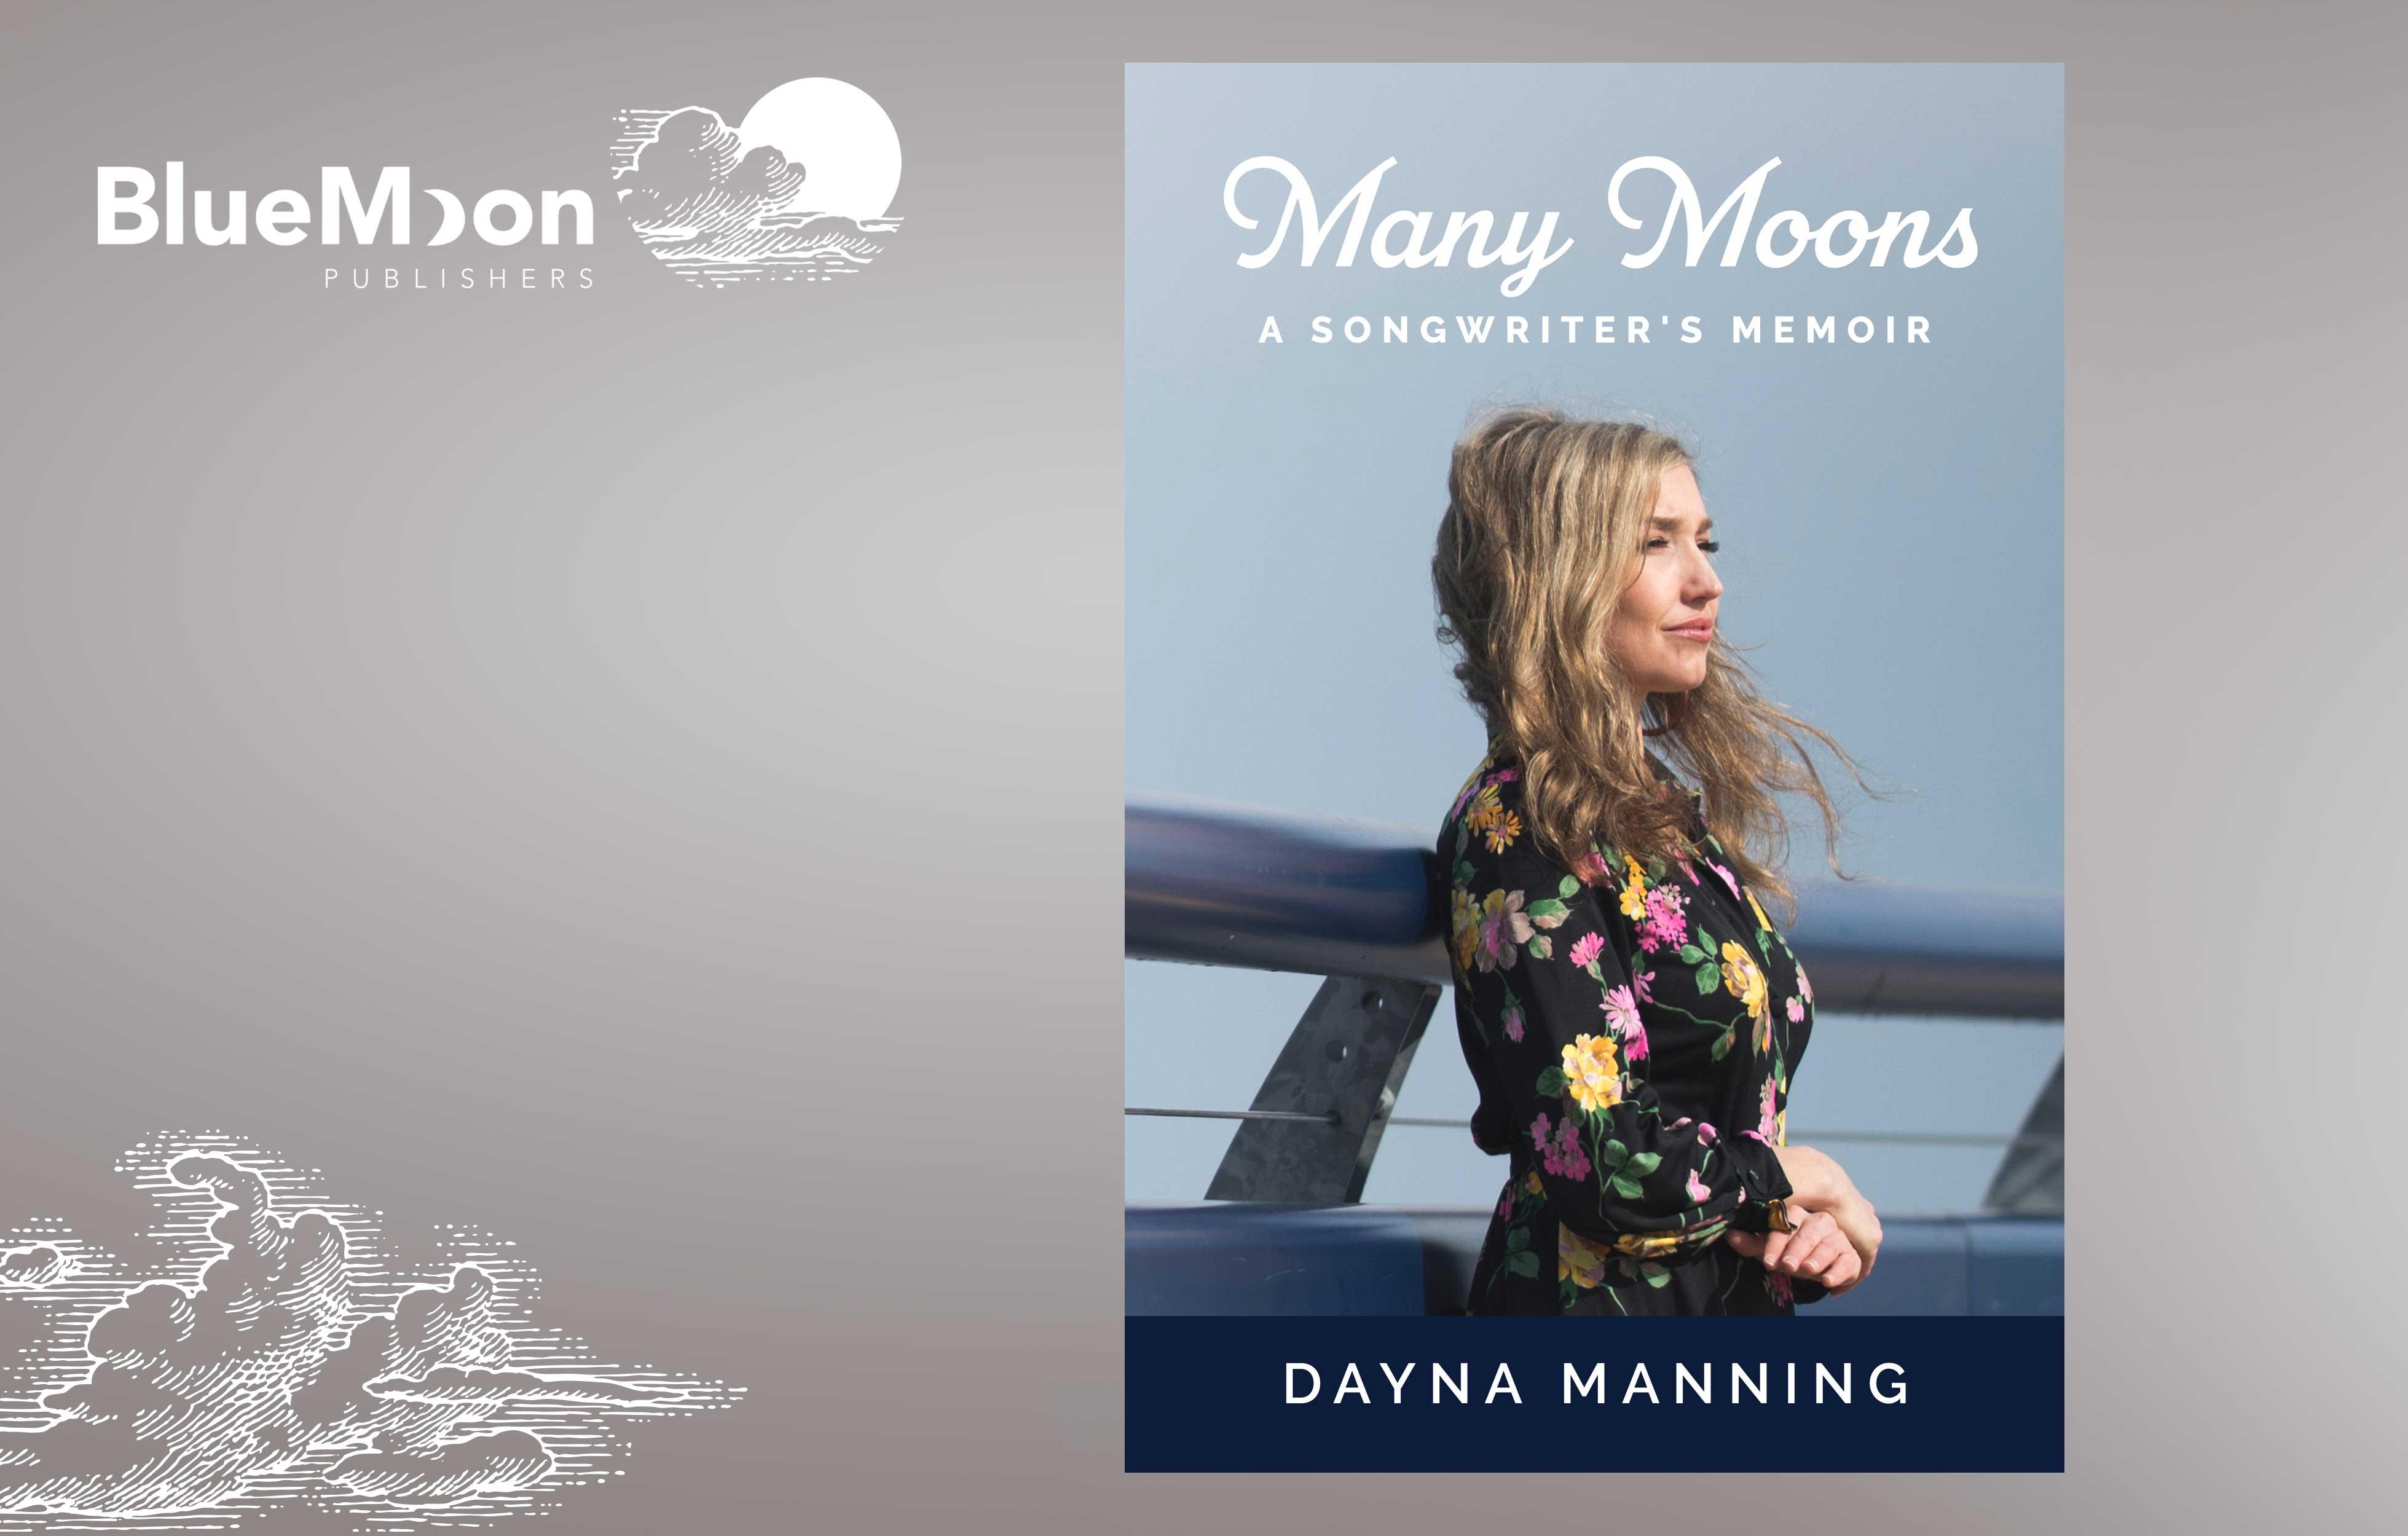 Songwriter Series by award-winning musicians - Blue Moon